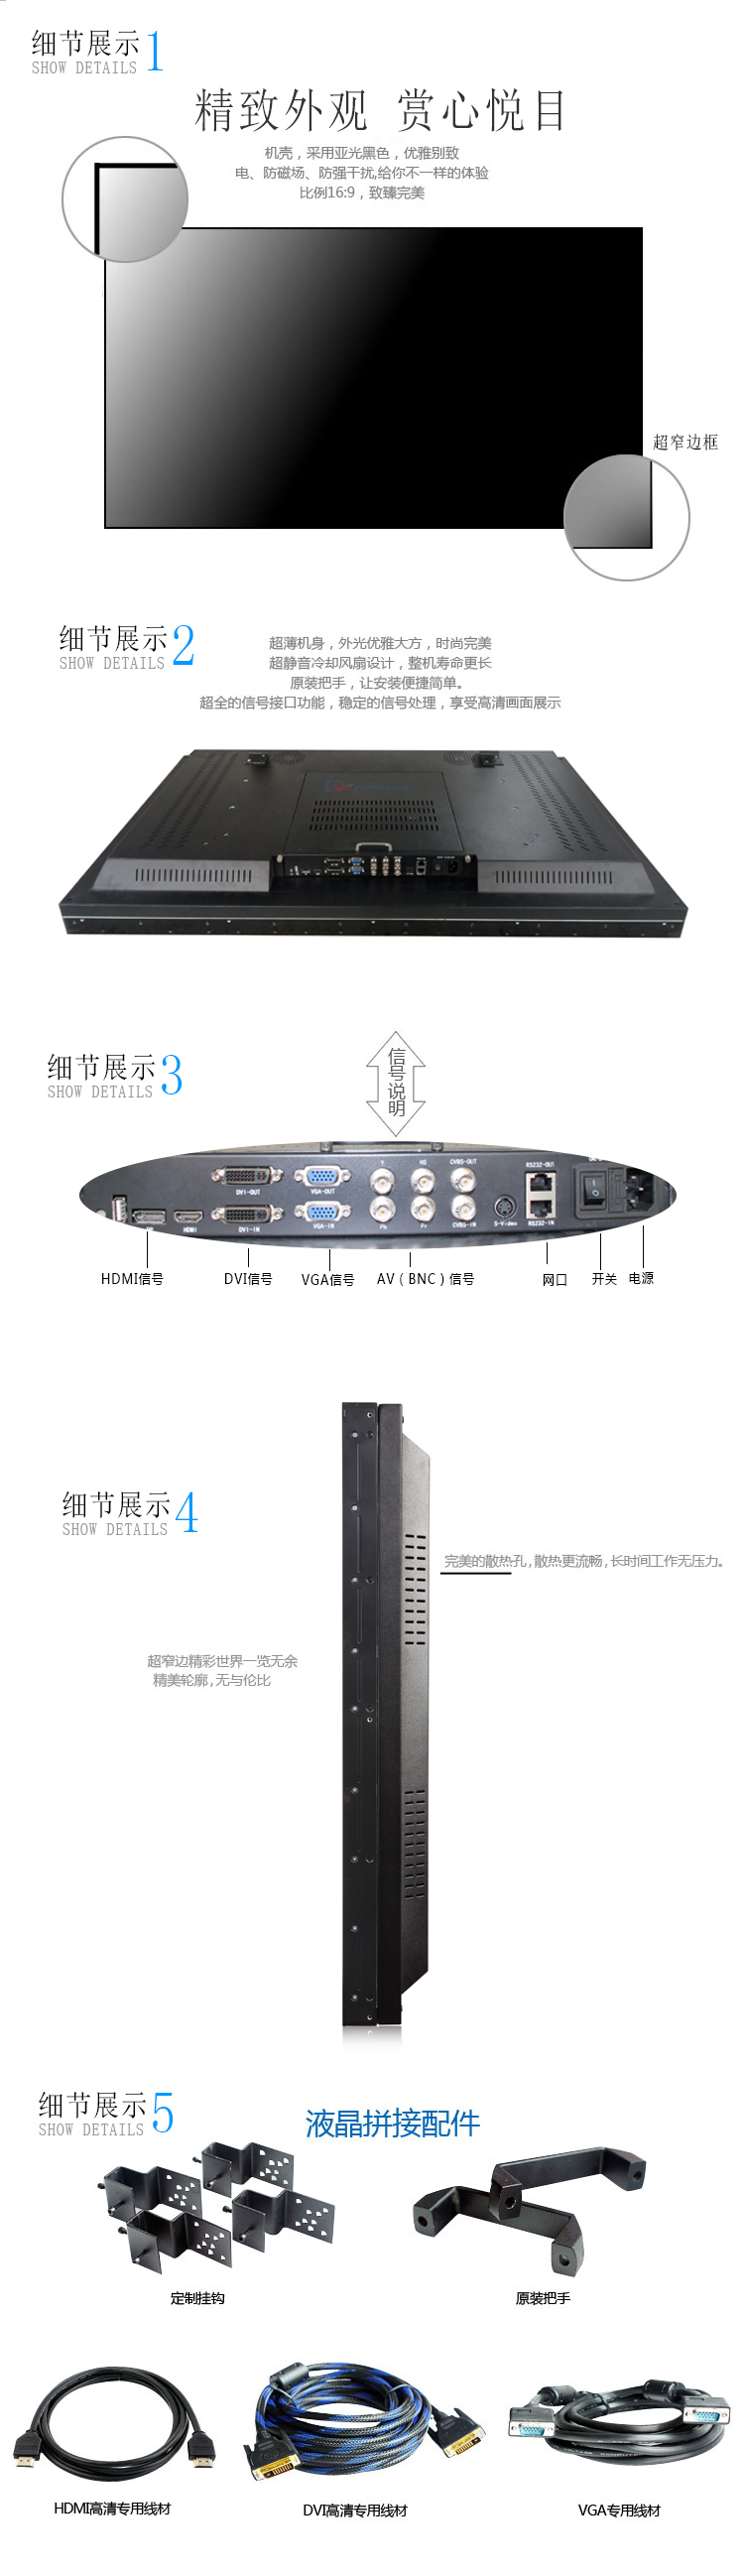 LG55寸高亮液晶拼接屏,1.8mm无缝液晶拼接大屏    型号: NZ55018-L1